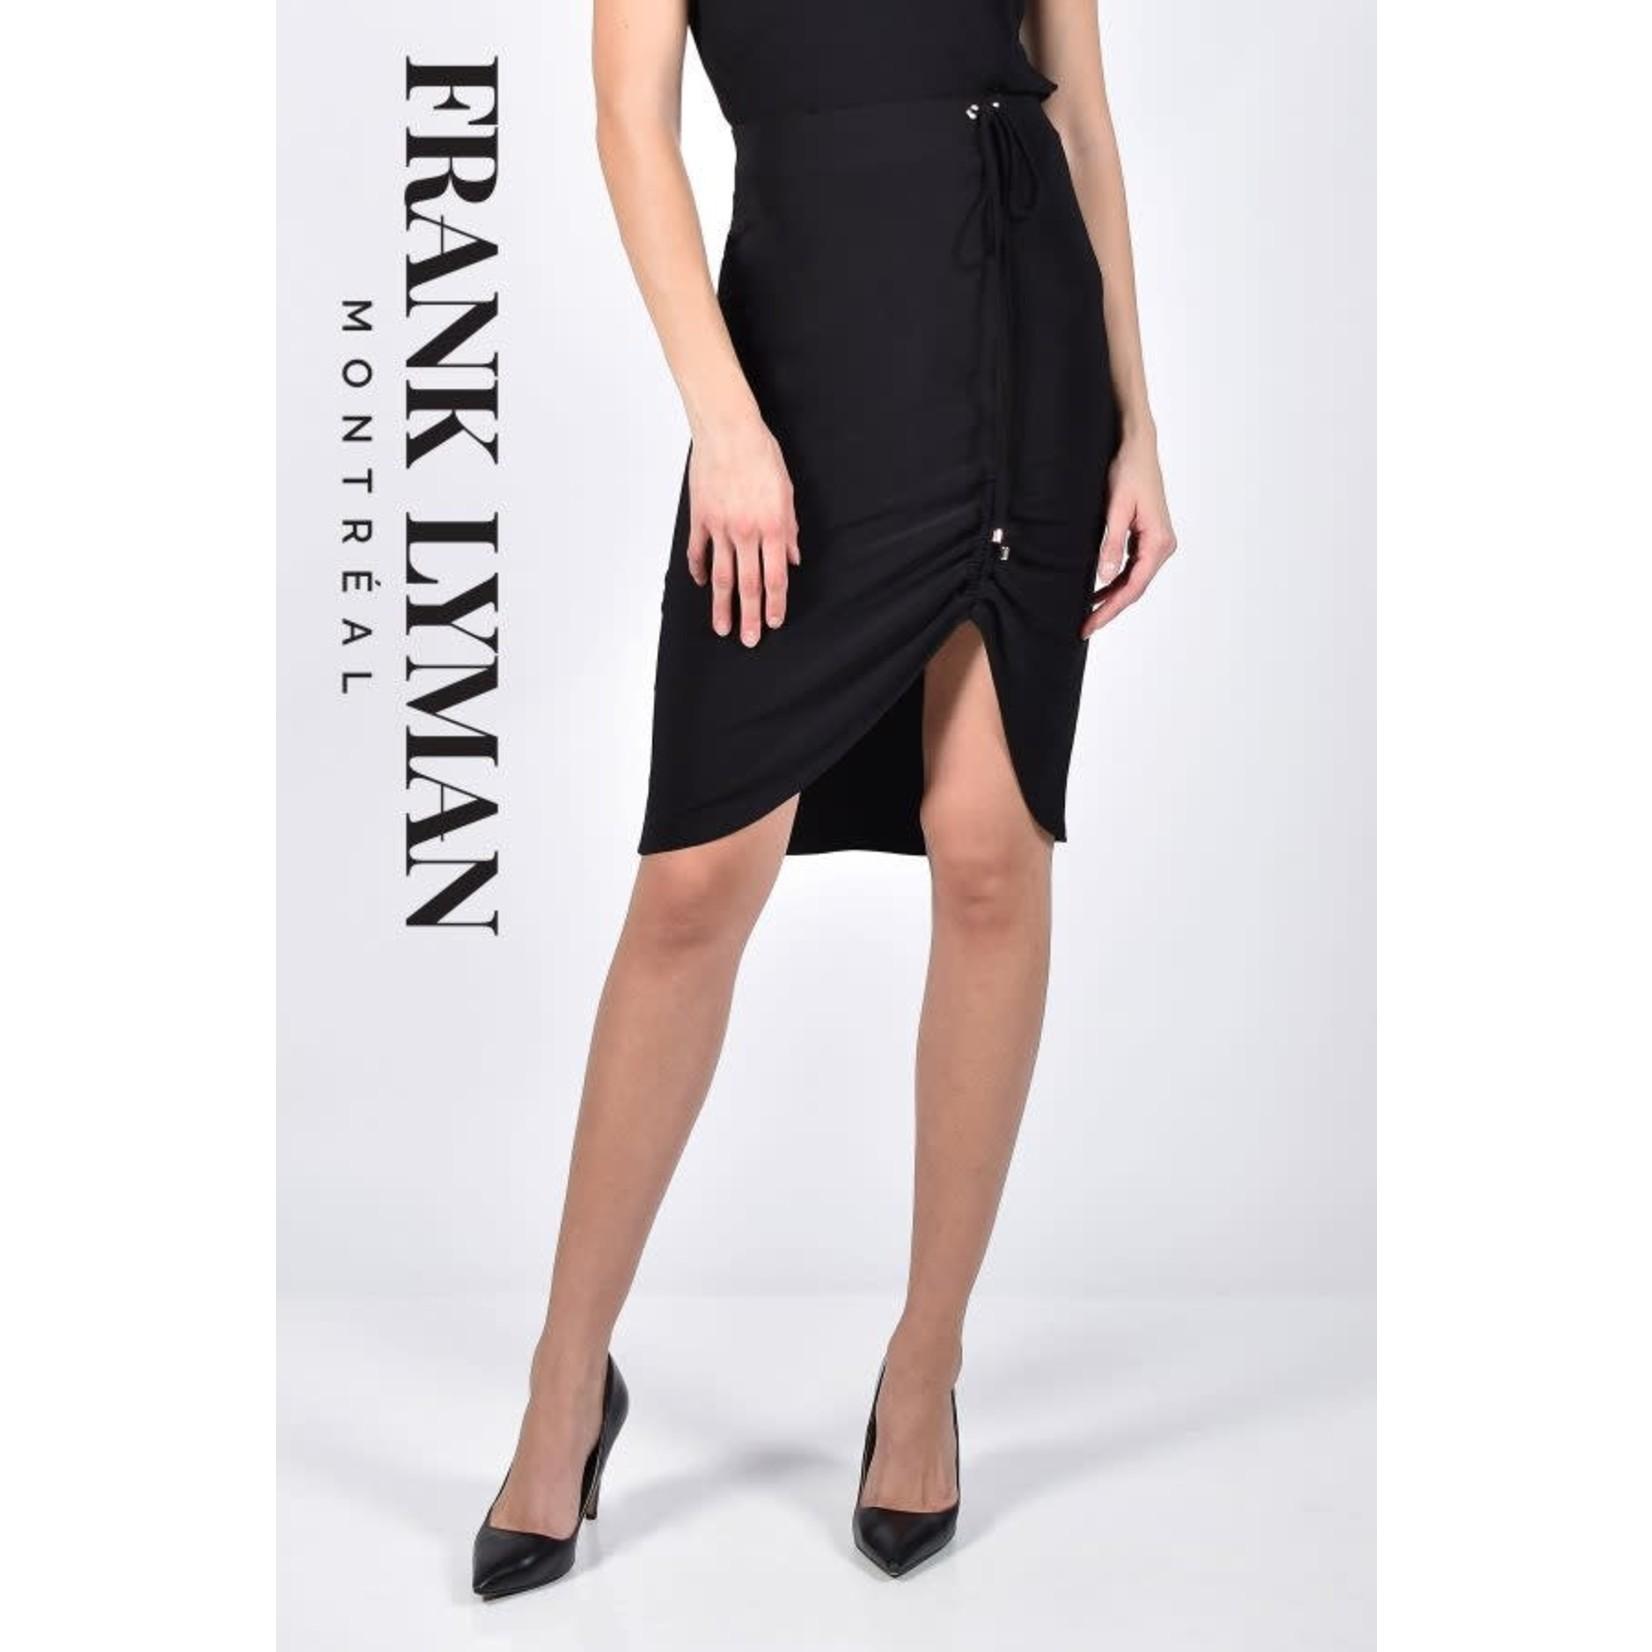 Frank Lyman Black Knit Skirt